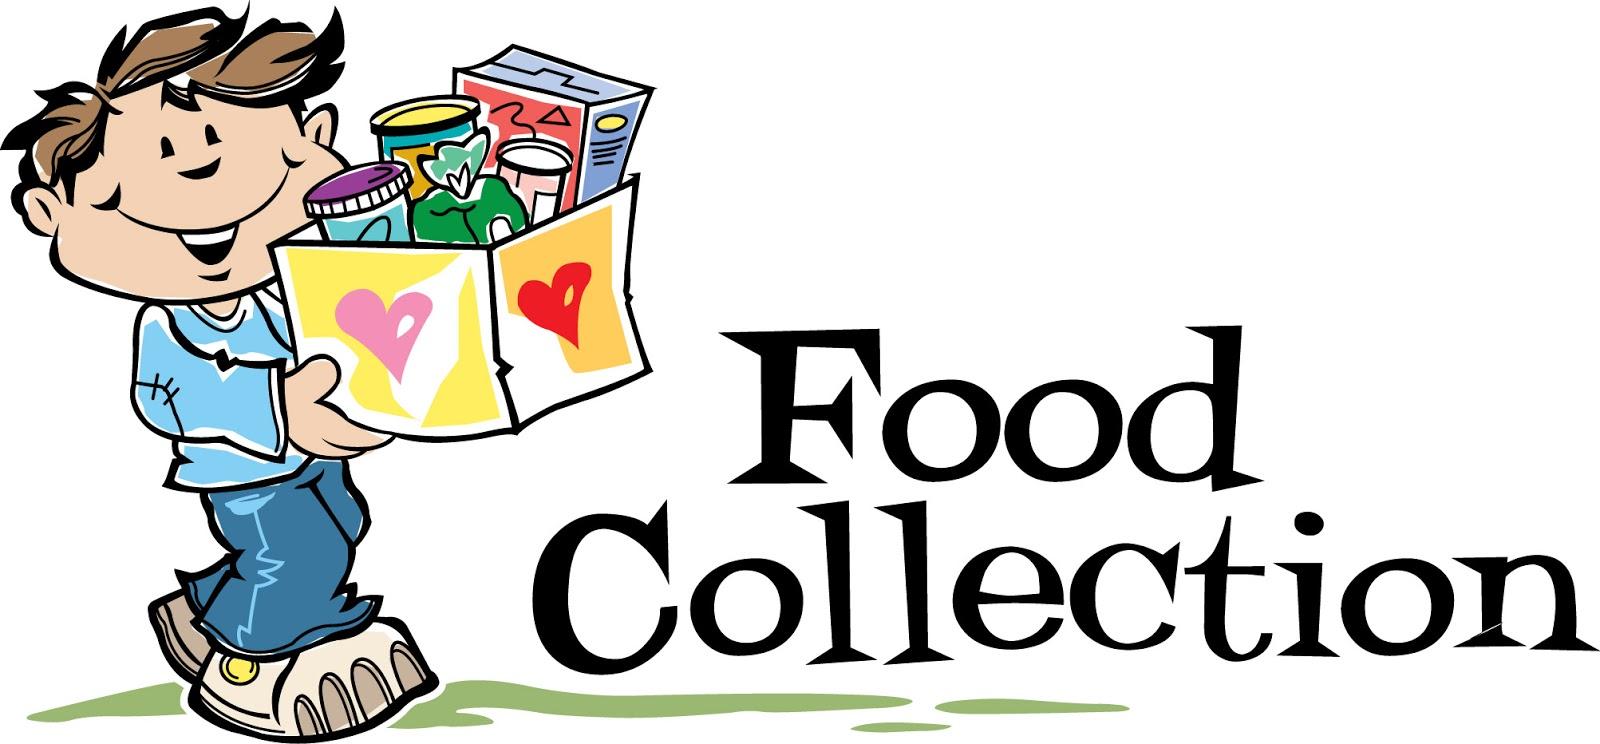 Food Drive Clipart & Food Drive Clip Art Images.